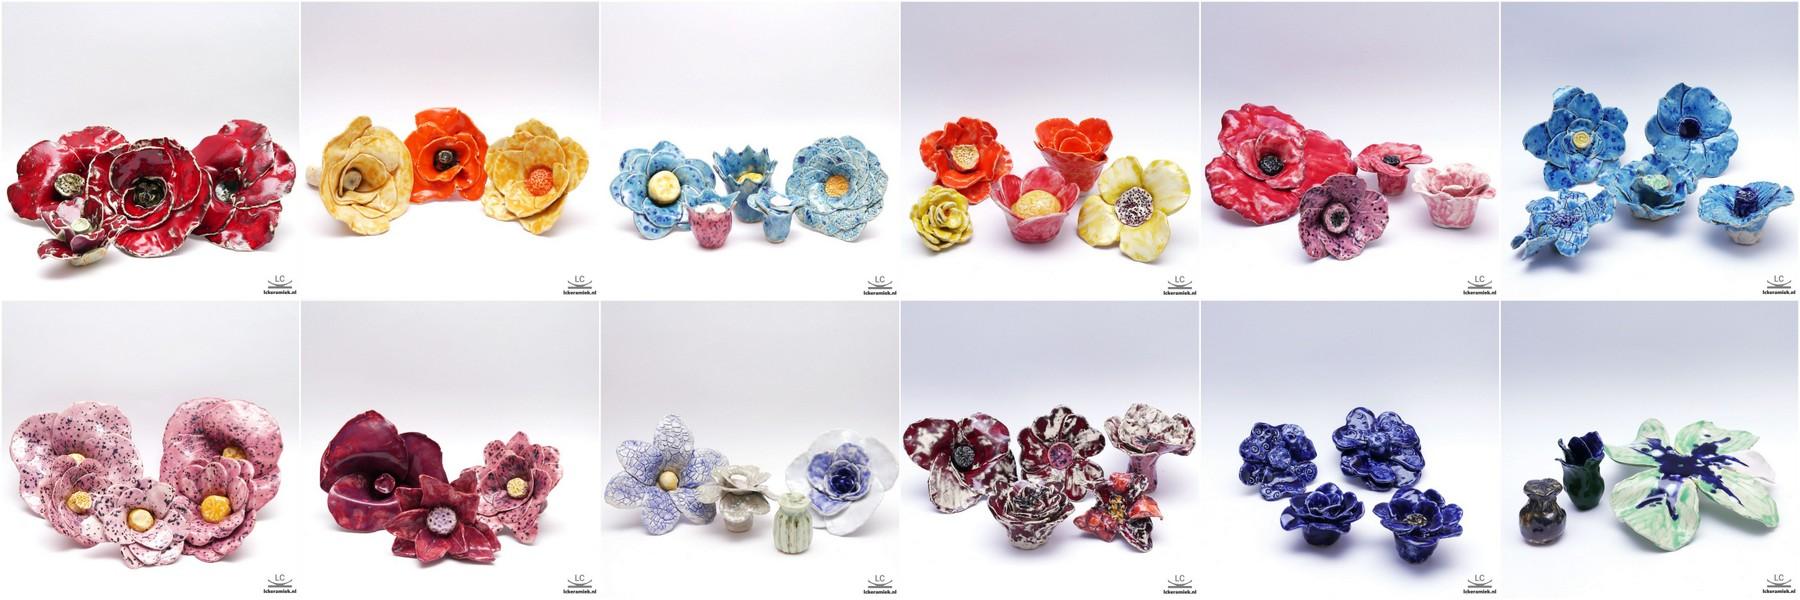 bloem van keramiek